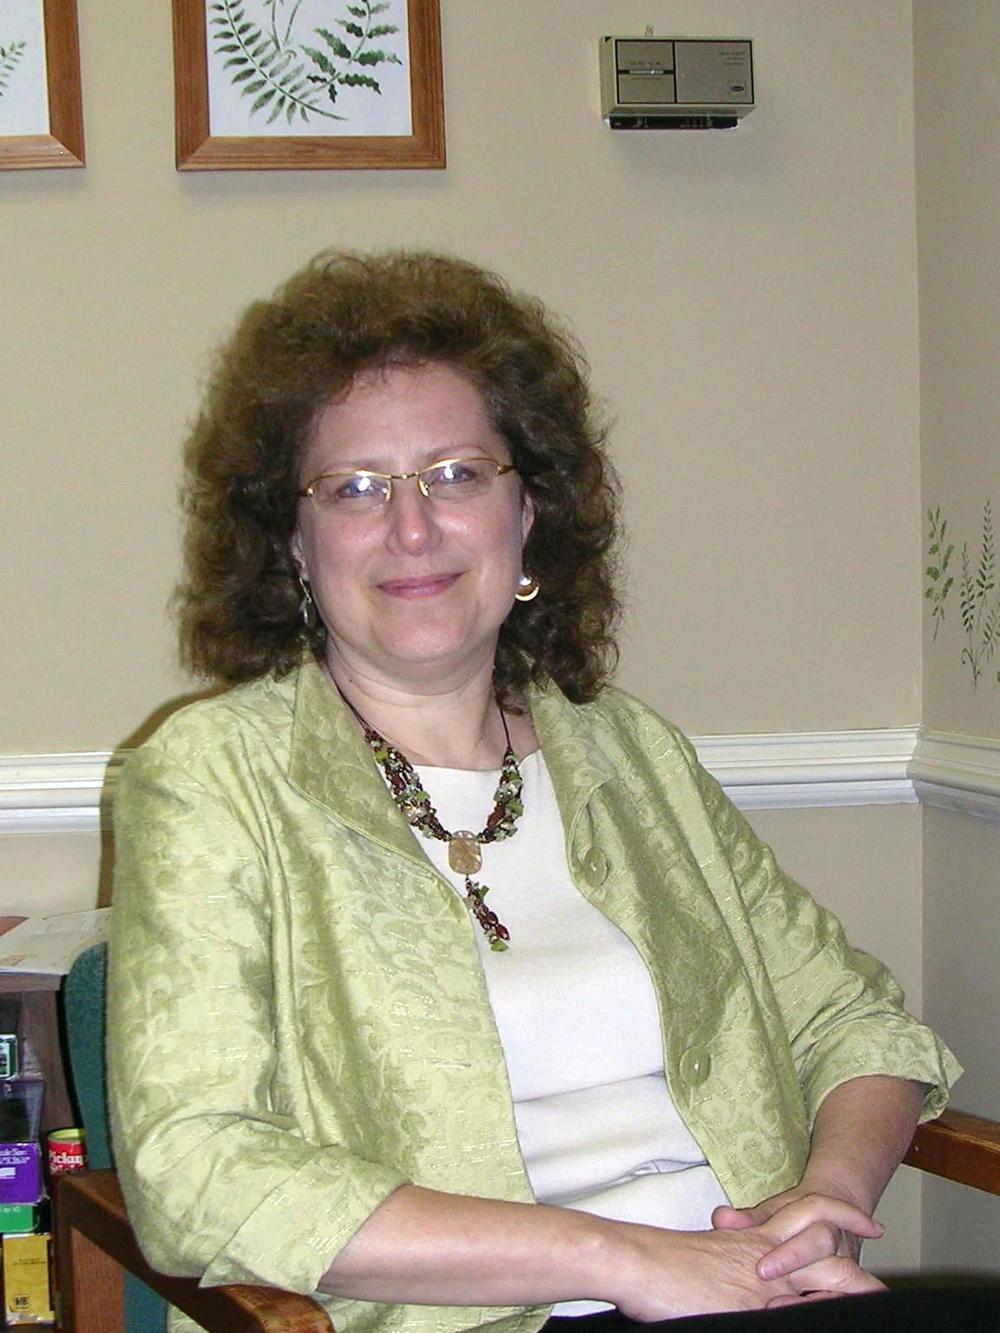 Amy Tanick Shulkin, Ph.D.   Owings Mills